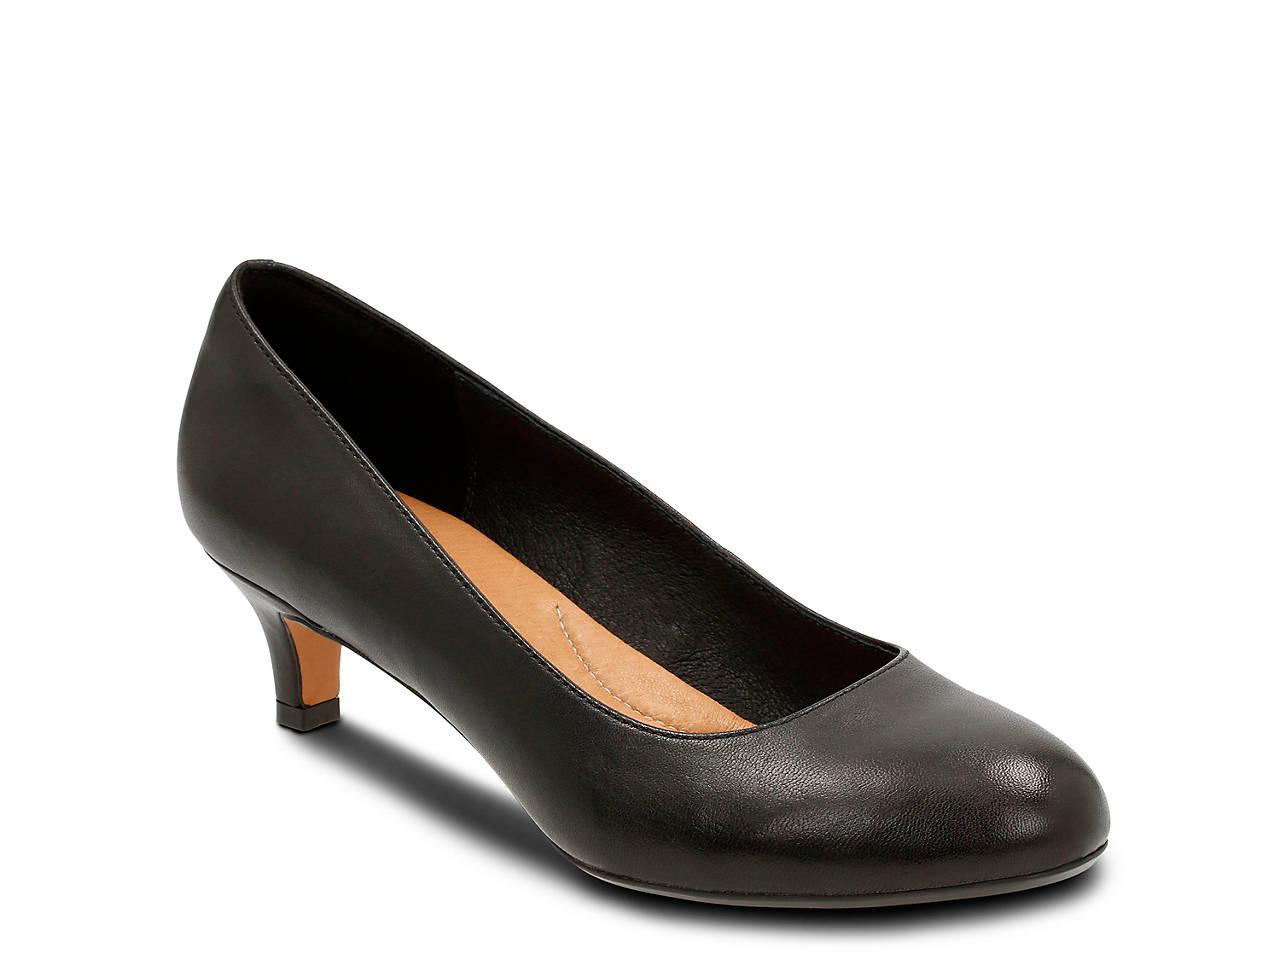 c7302466862b Clarks Artisan Heavenly Shine Pump Women s Shoes